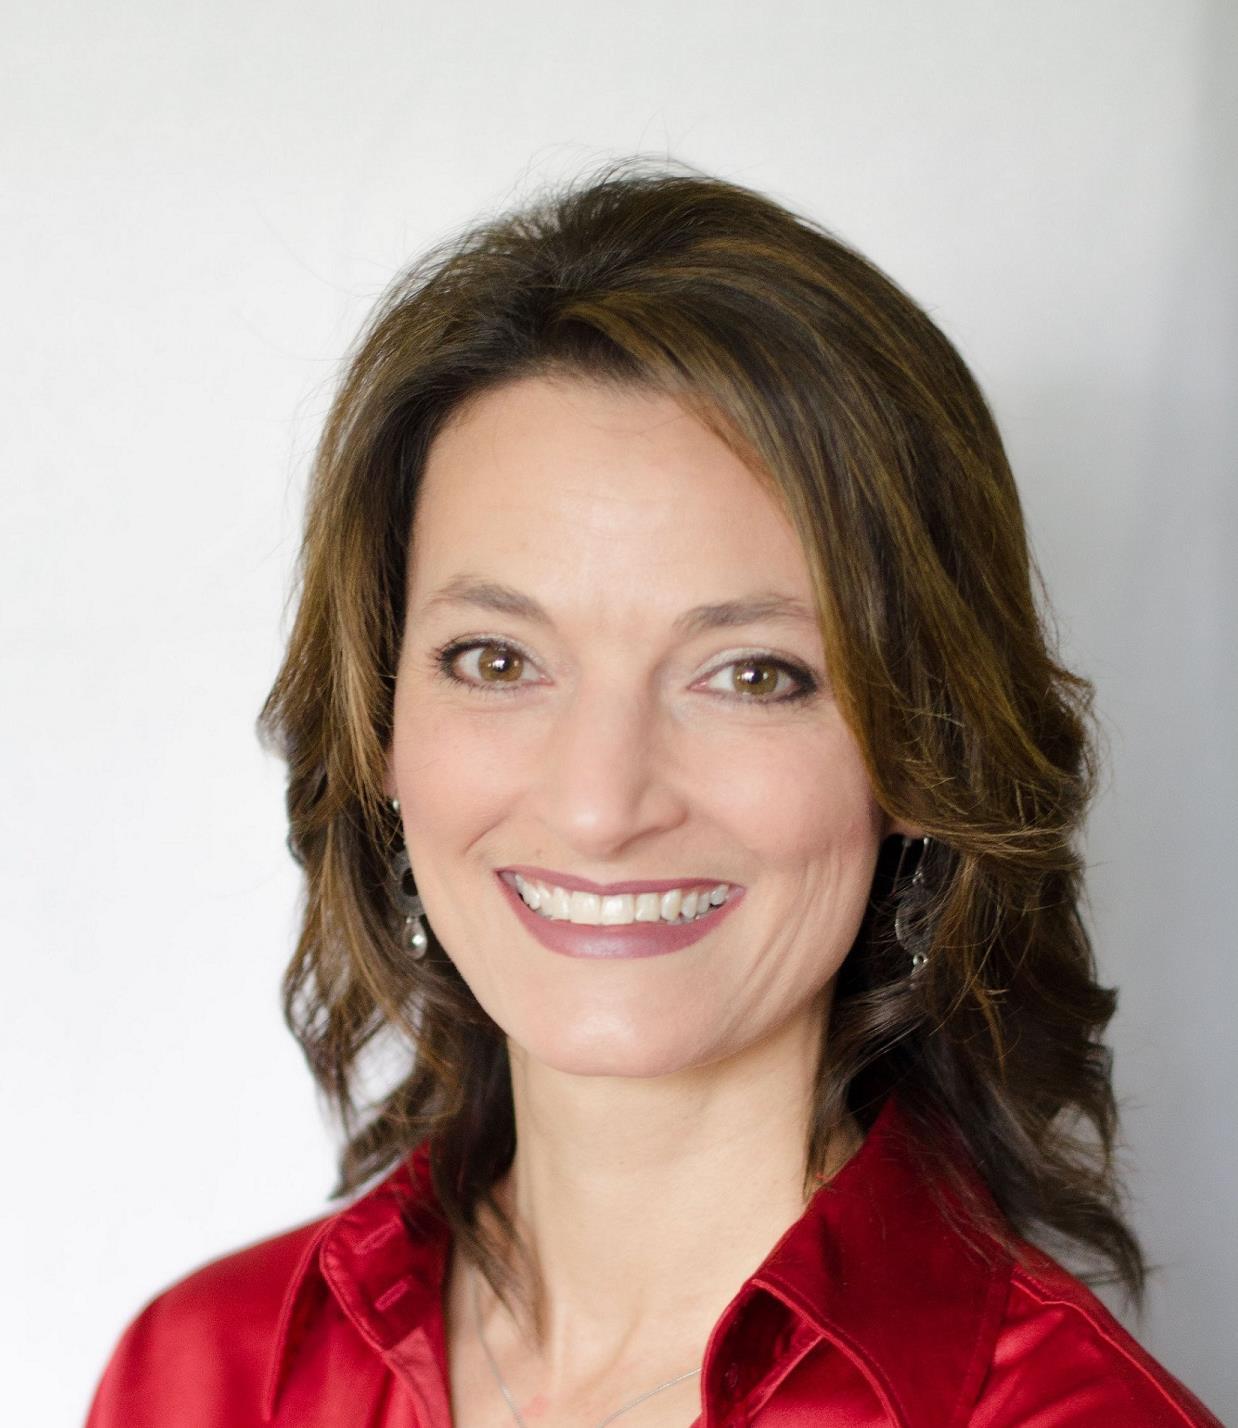 Vicki Moussette Kastner